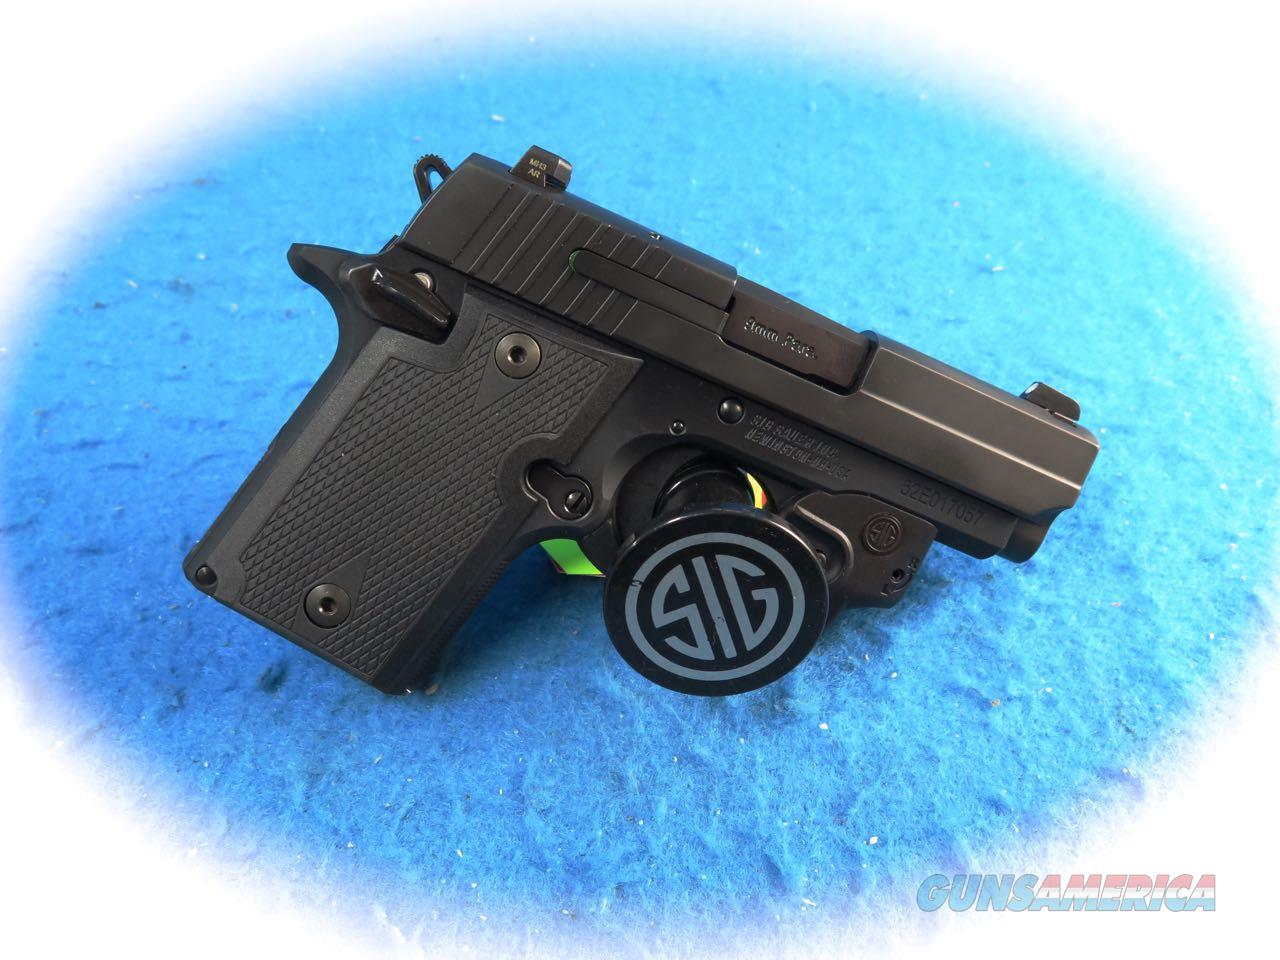 Sig Sauer P938 9MM Semi Auto Pistol W/Free Laser **New**  Guns > Pistols > Sig - Sauer/Sigarms Pistols > P938